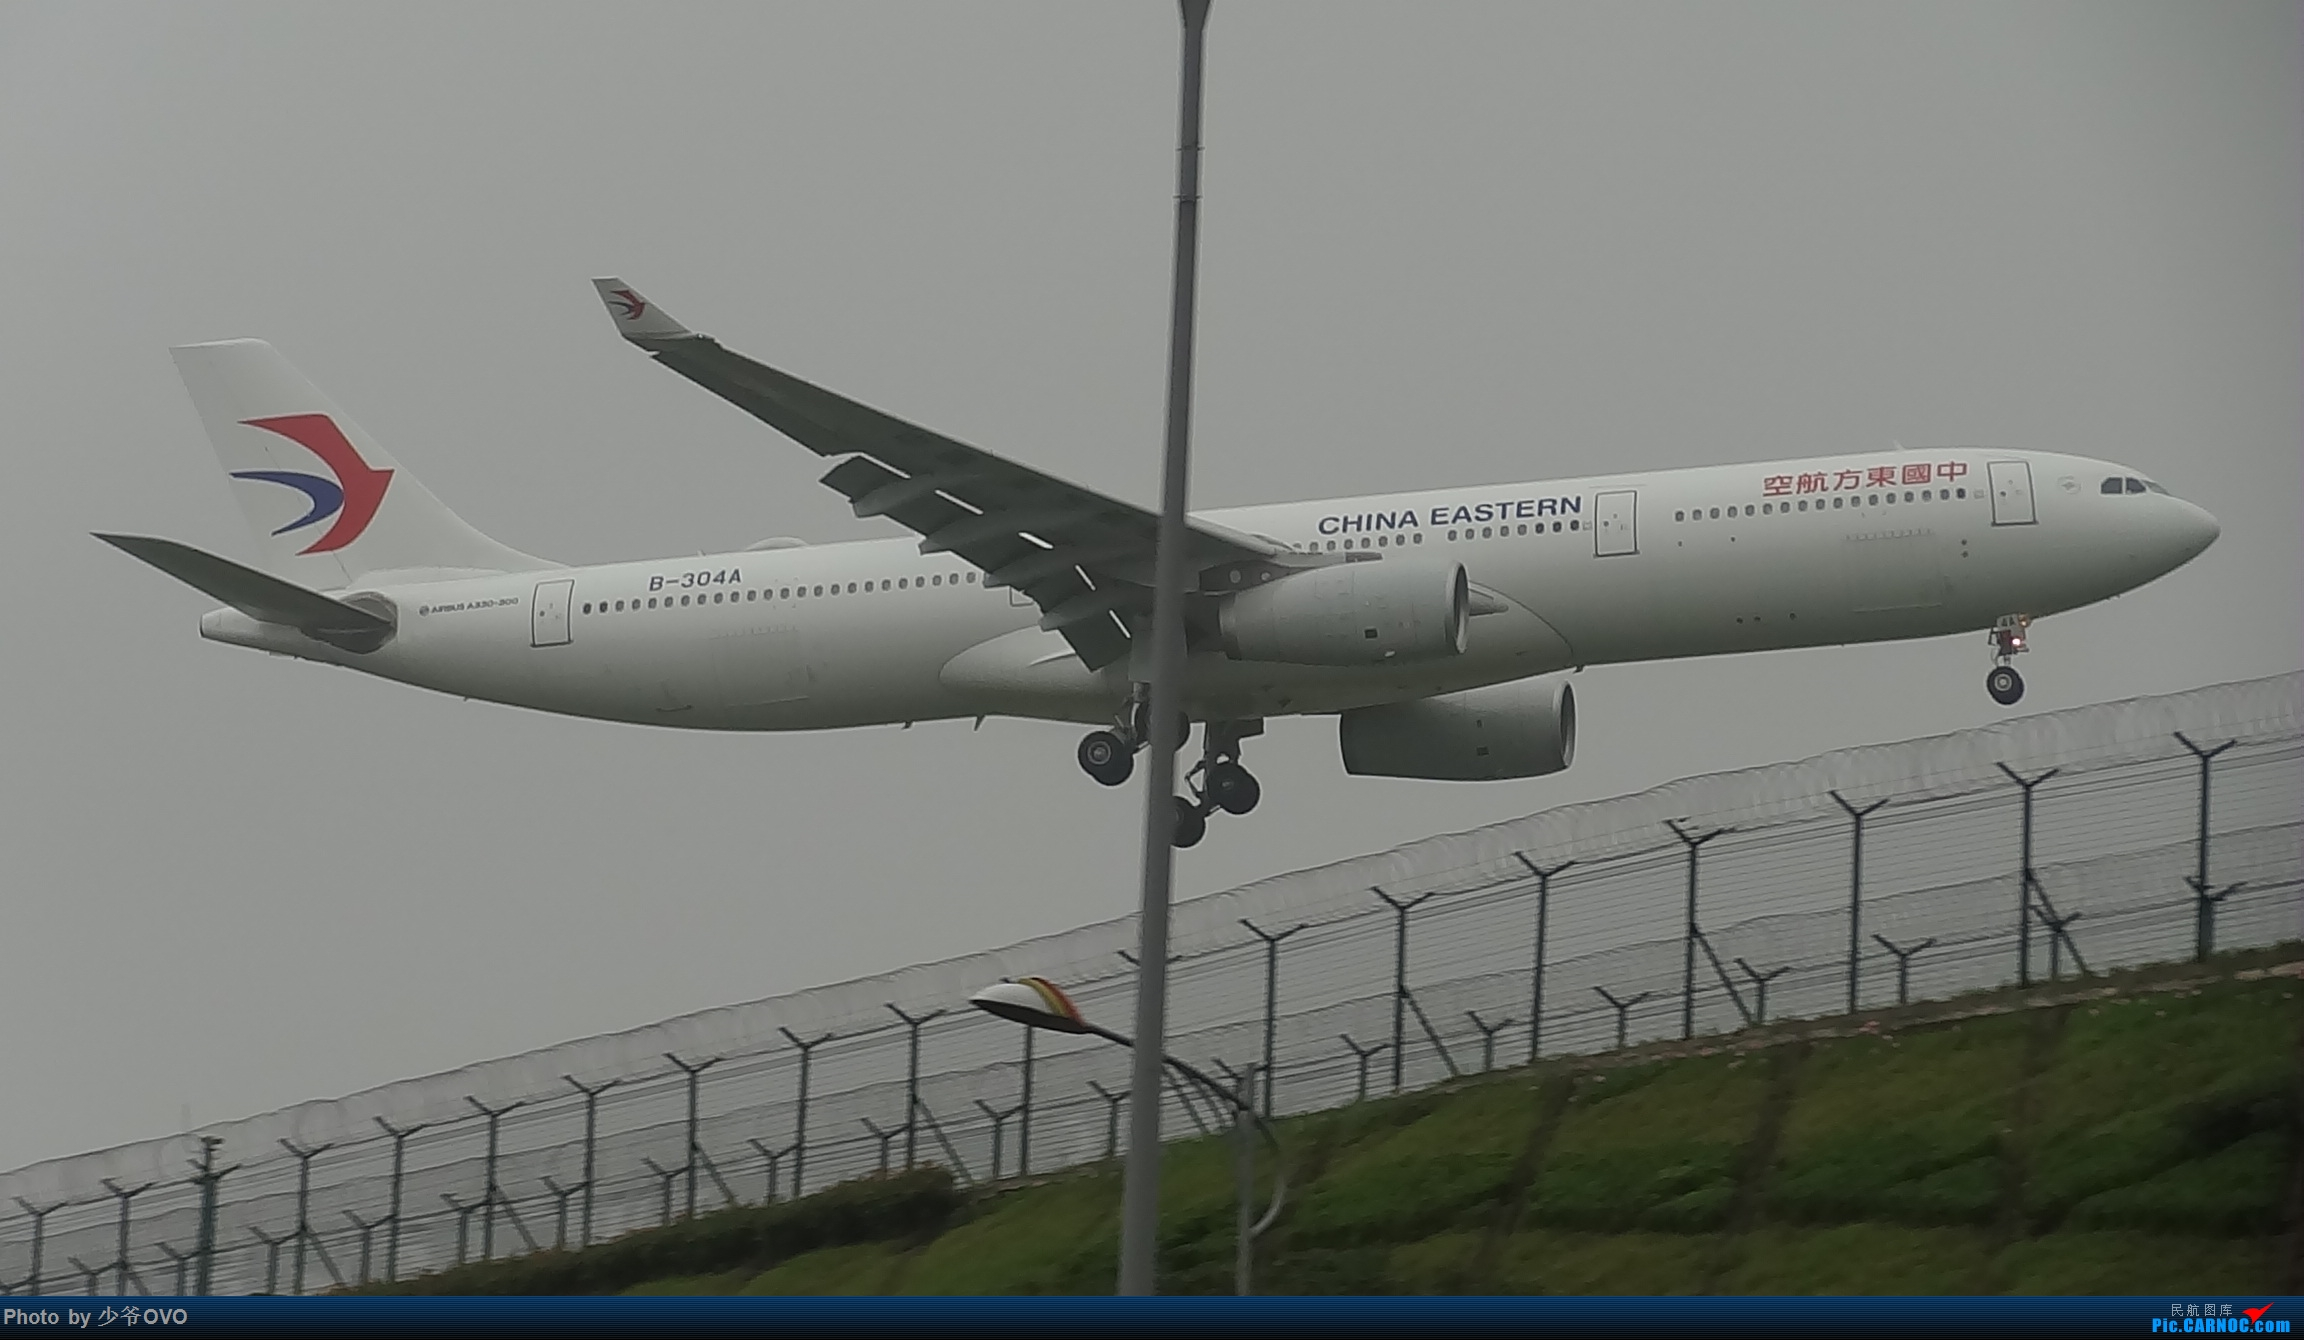 Re:[原创]CKG重庆江北机场拍机 ,渣图一堆,多指点 AIRBUS A330-300 B-304A 中国重庆江北国际机场